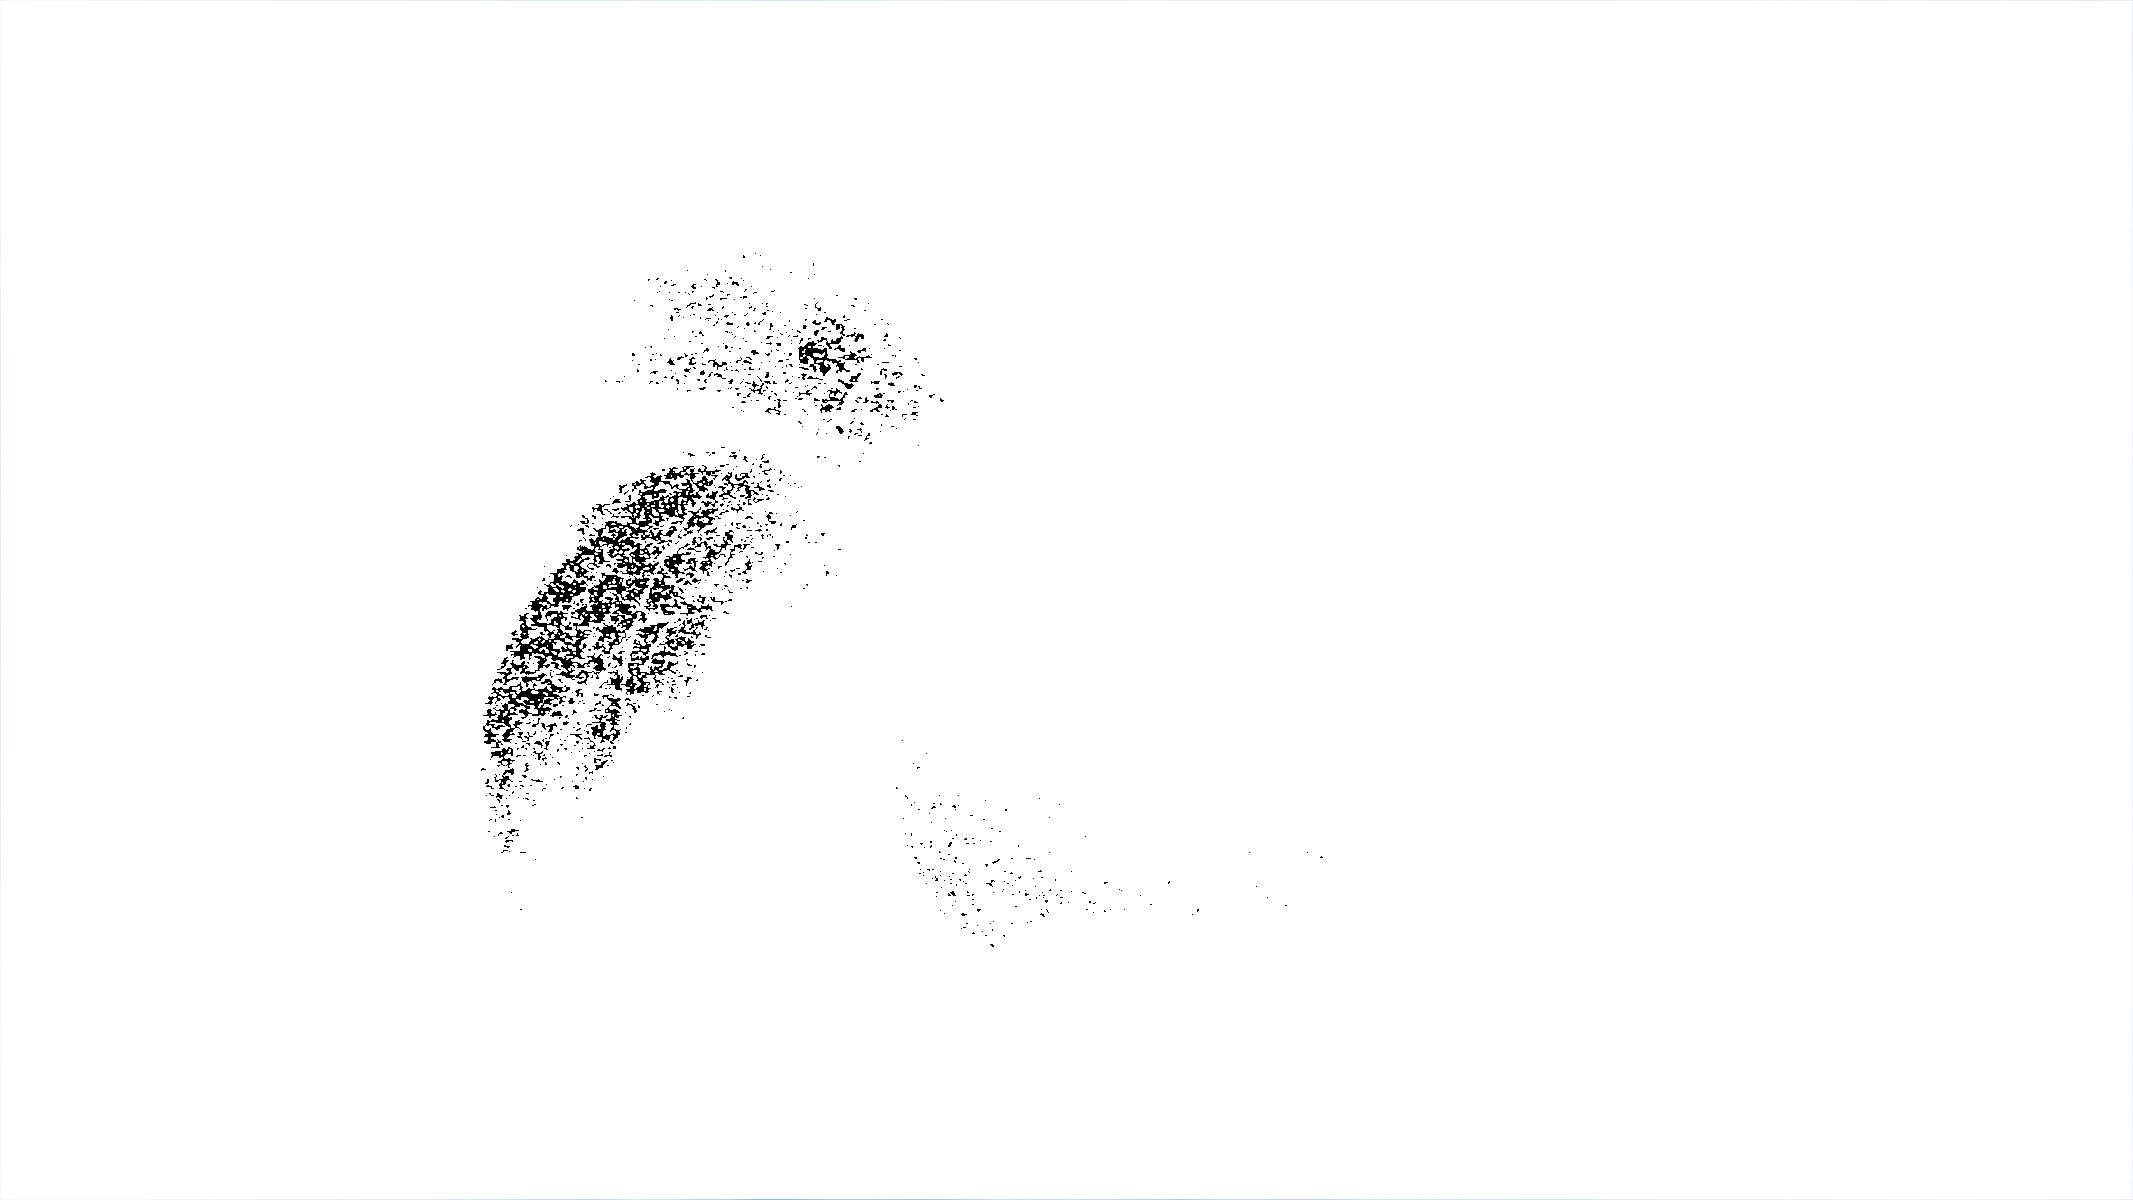 4.5/trisquel-wallpapers-4.5/data/usr/share/backgrounds/trisquel.png